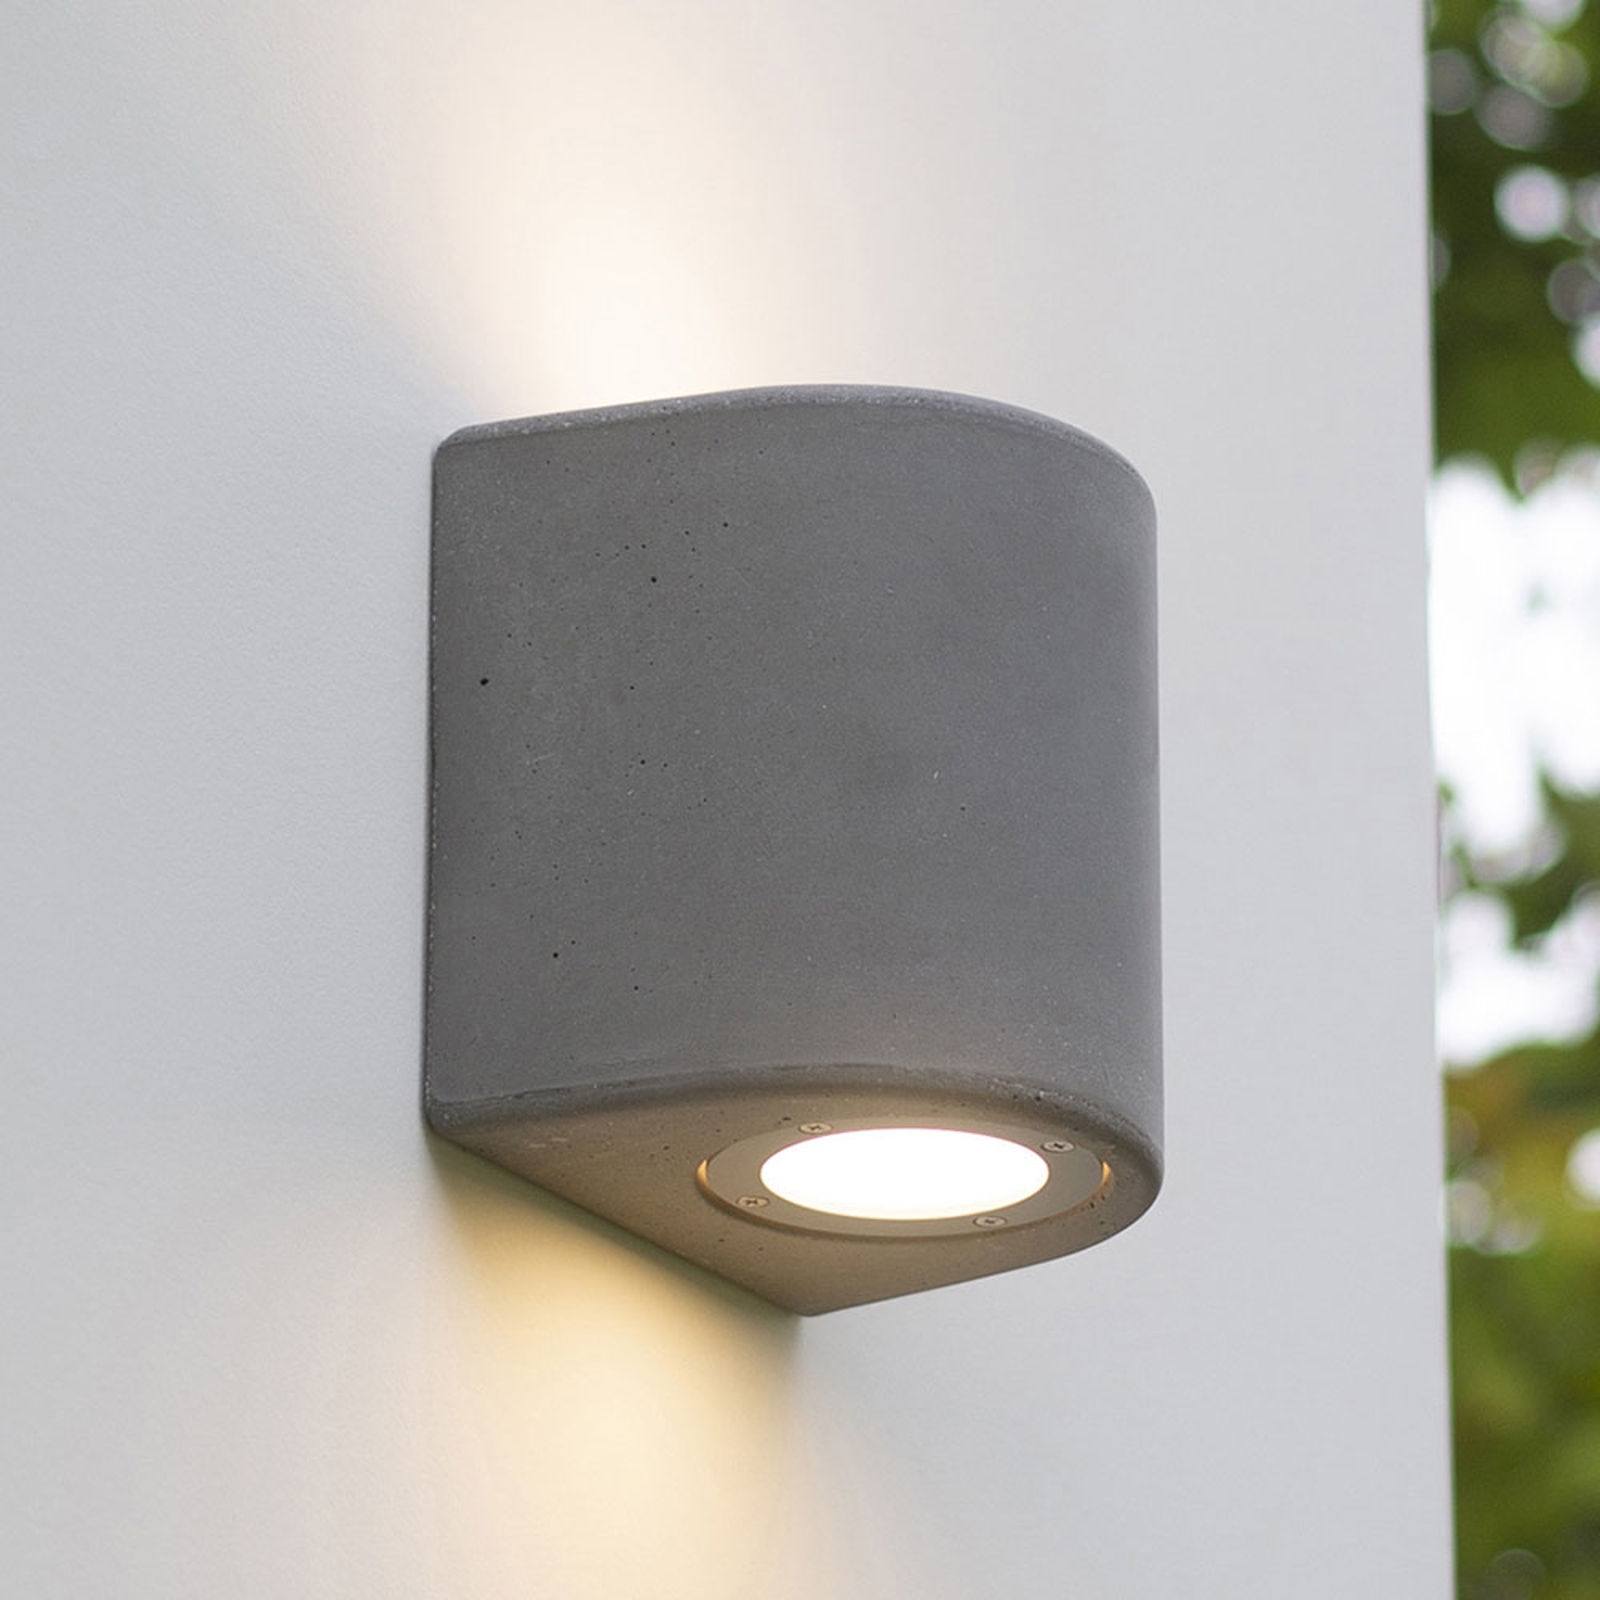 Martinelli Luce Koala LED-utevegglampe up/down